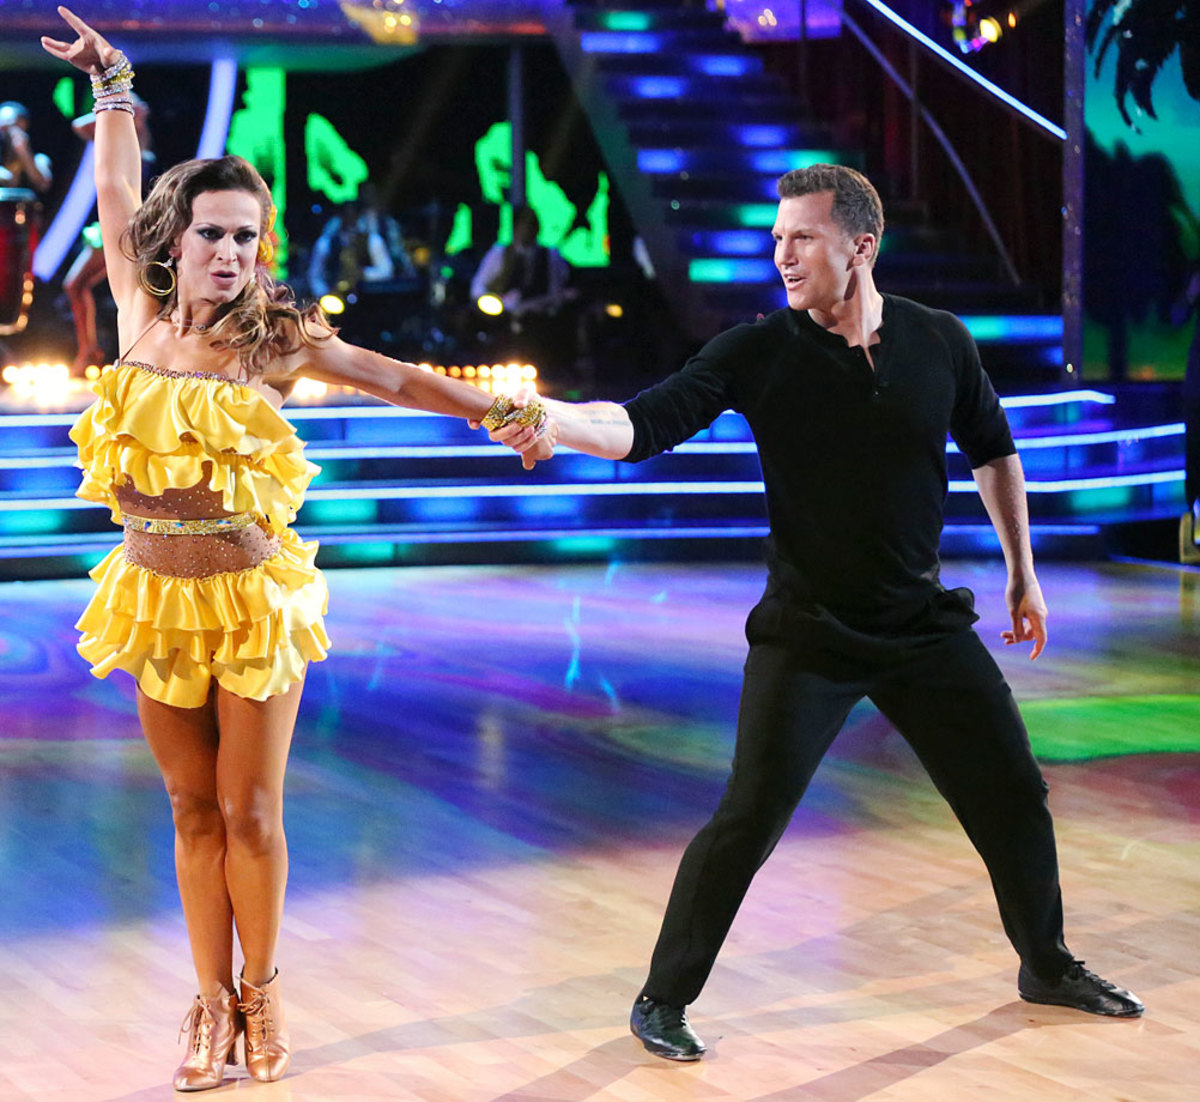 sean-avery-karina-smirnoff-dancing-with-the-stars.jpg